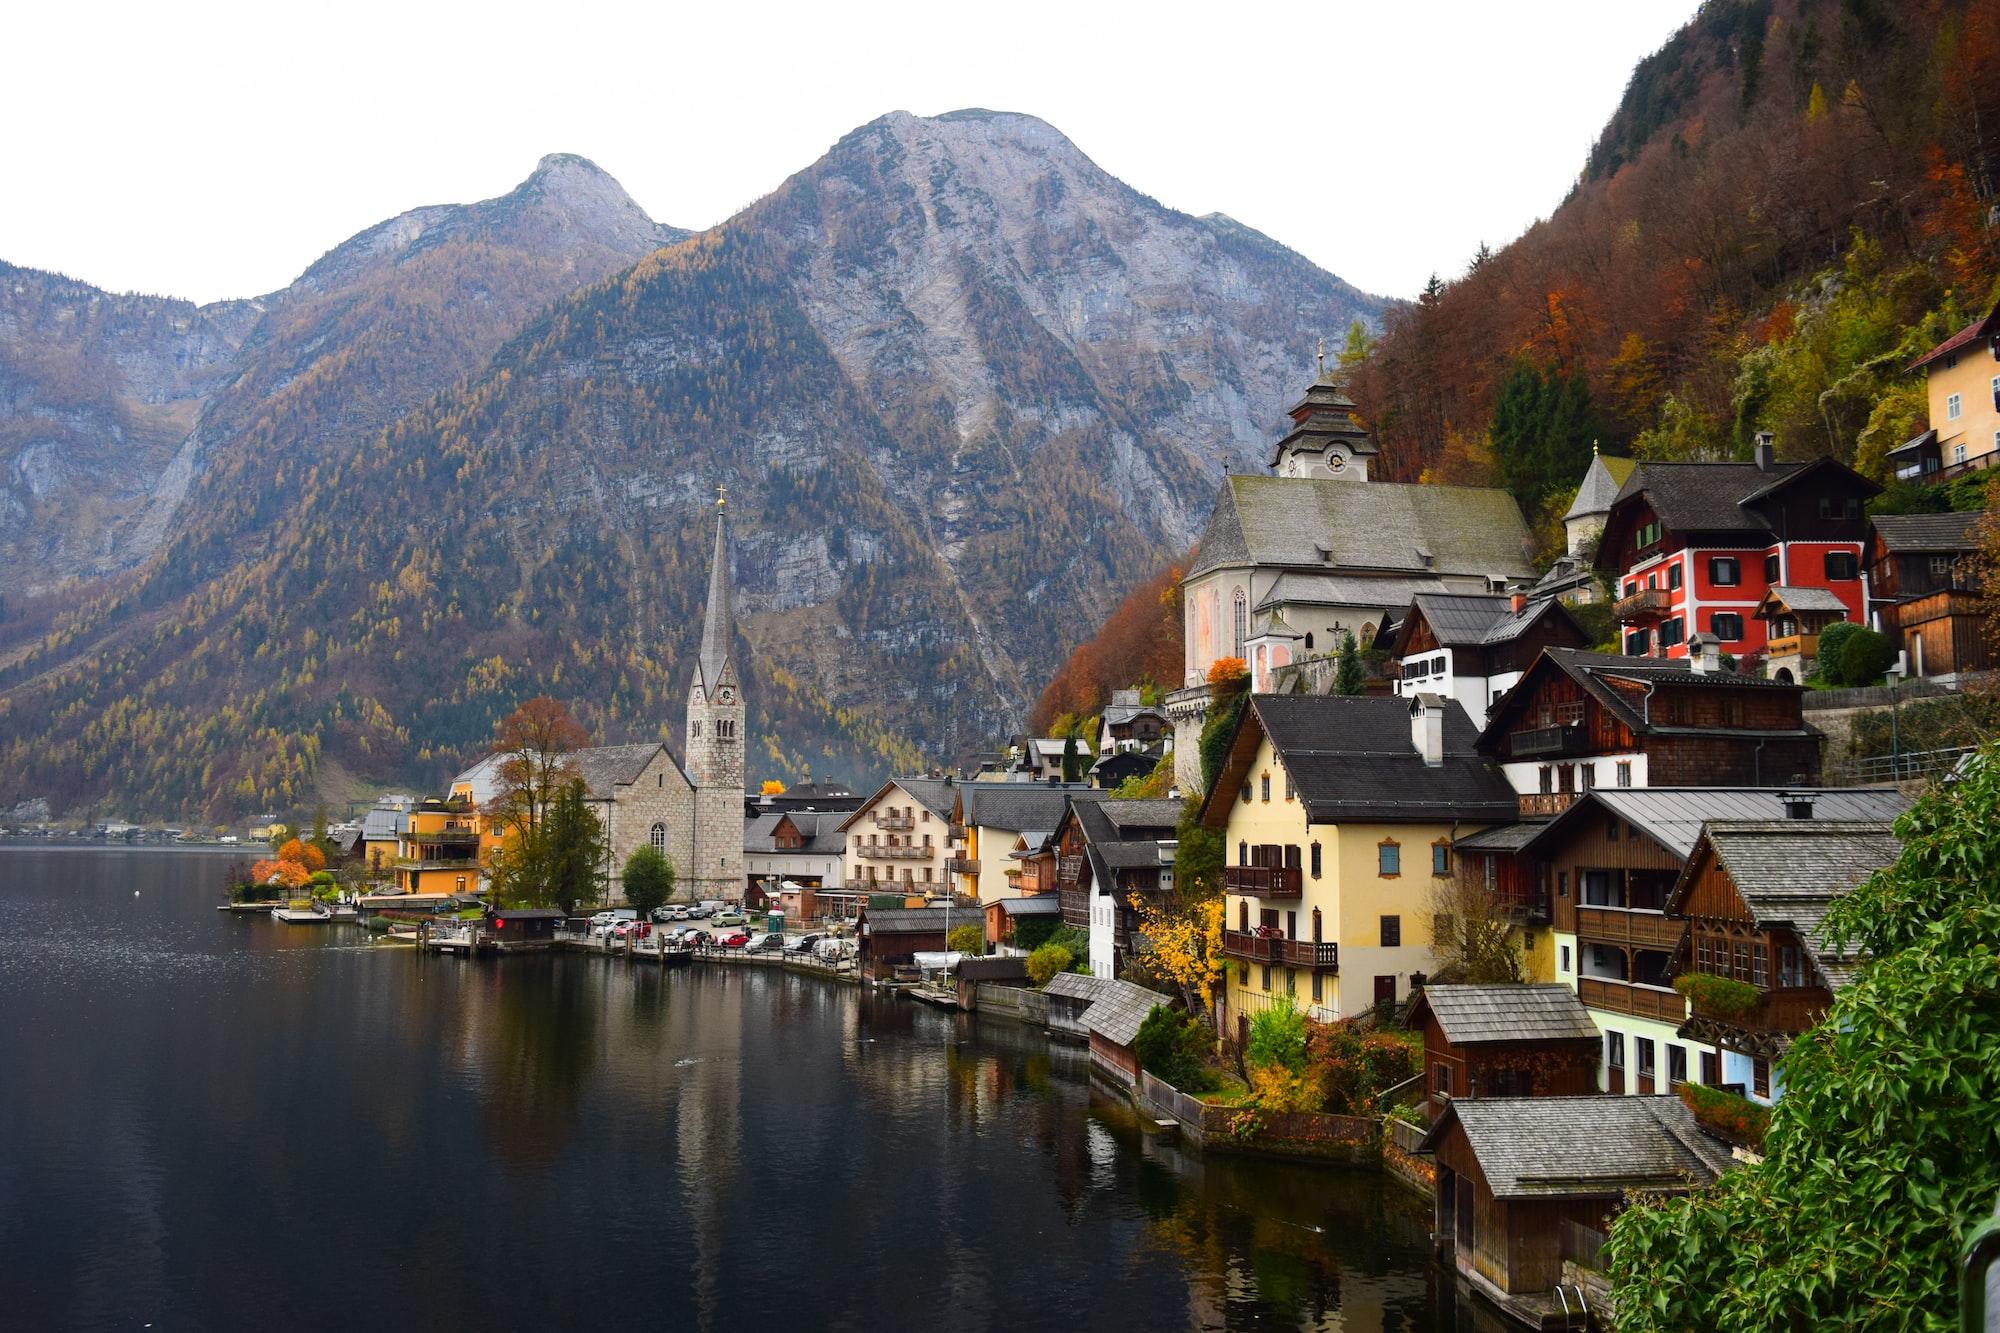 This photo was taken overlooking the town of Hallstatt in Austria, in autumn